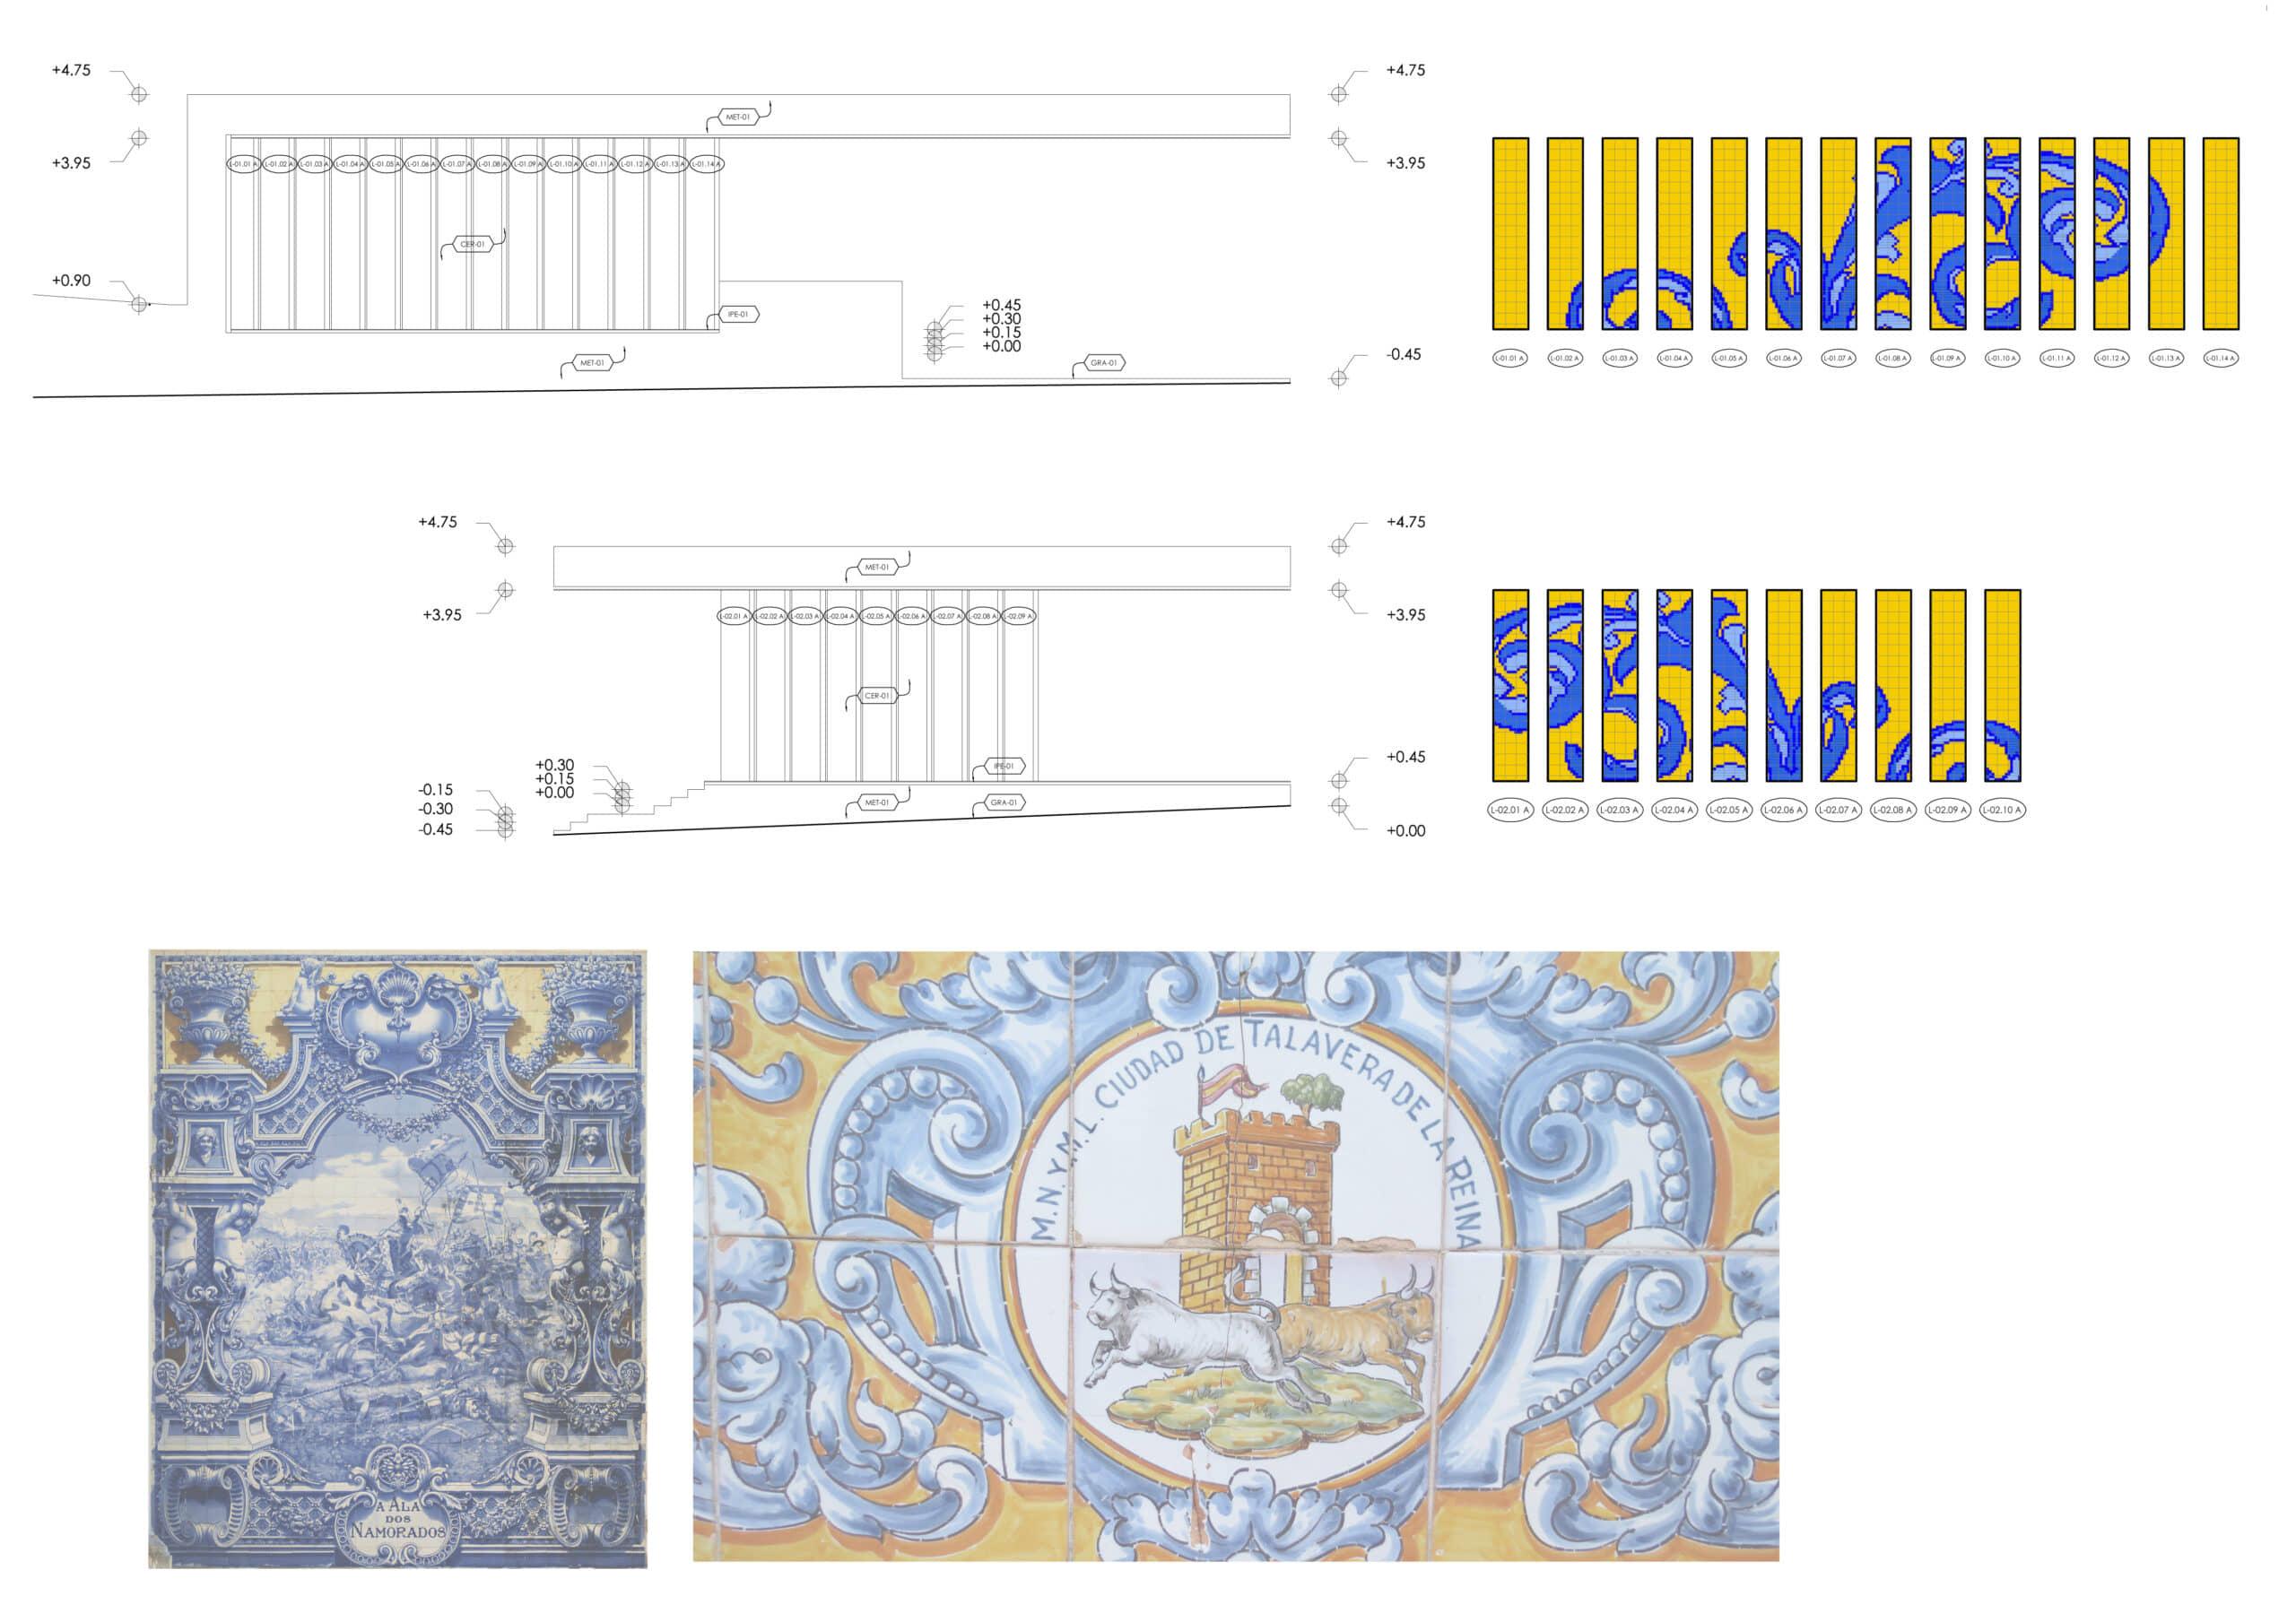 Azulejos de Talavera de la Reina